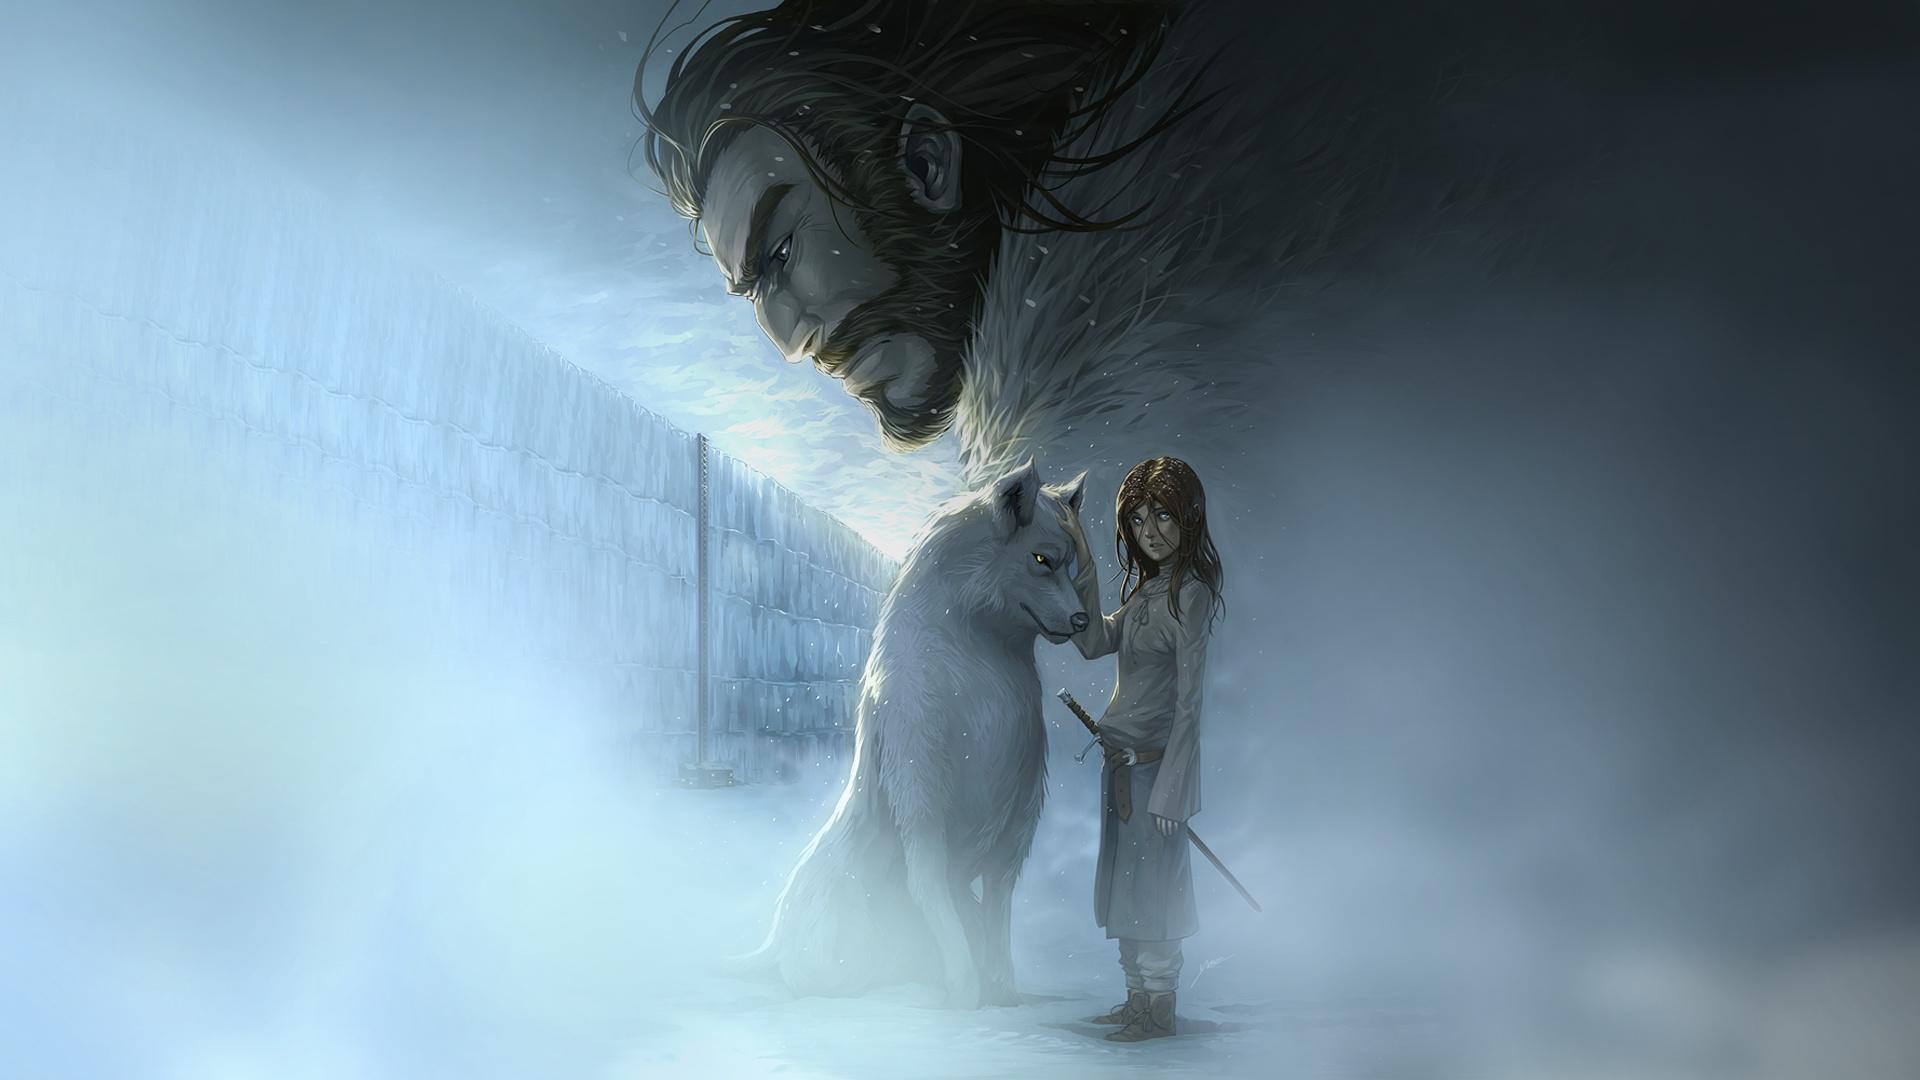 877396-artwork-arya-stark-game-of-thrones